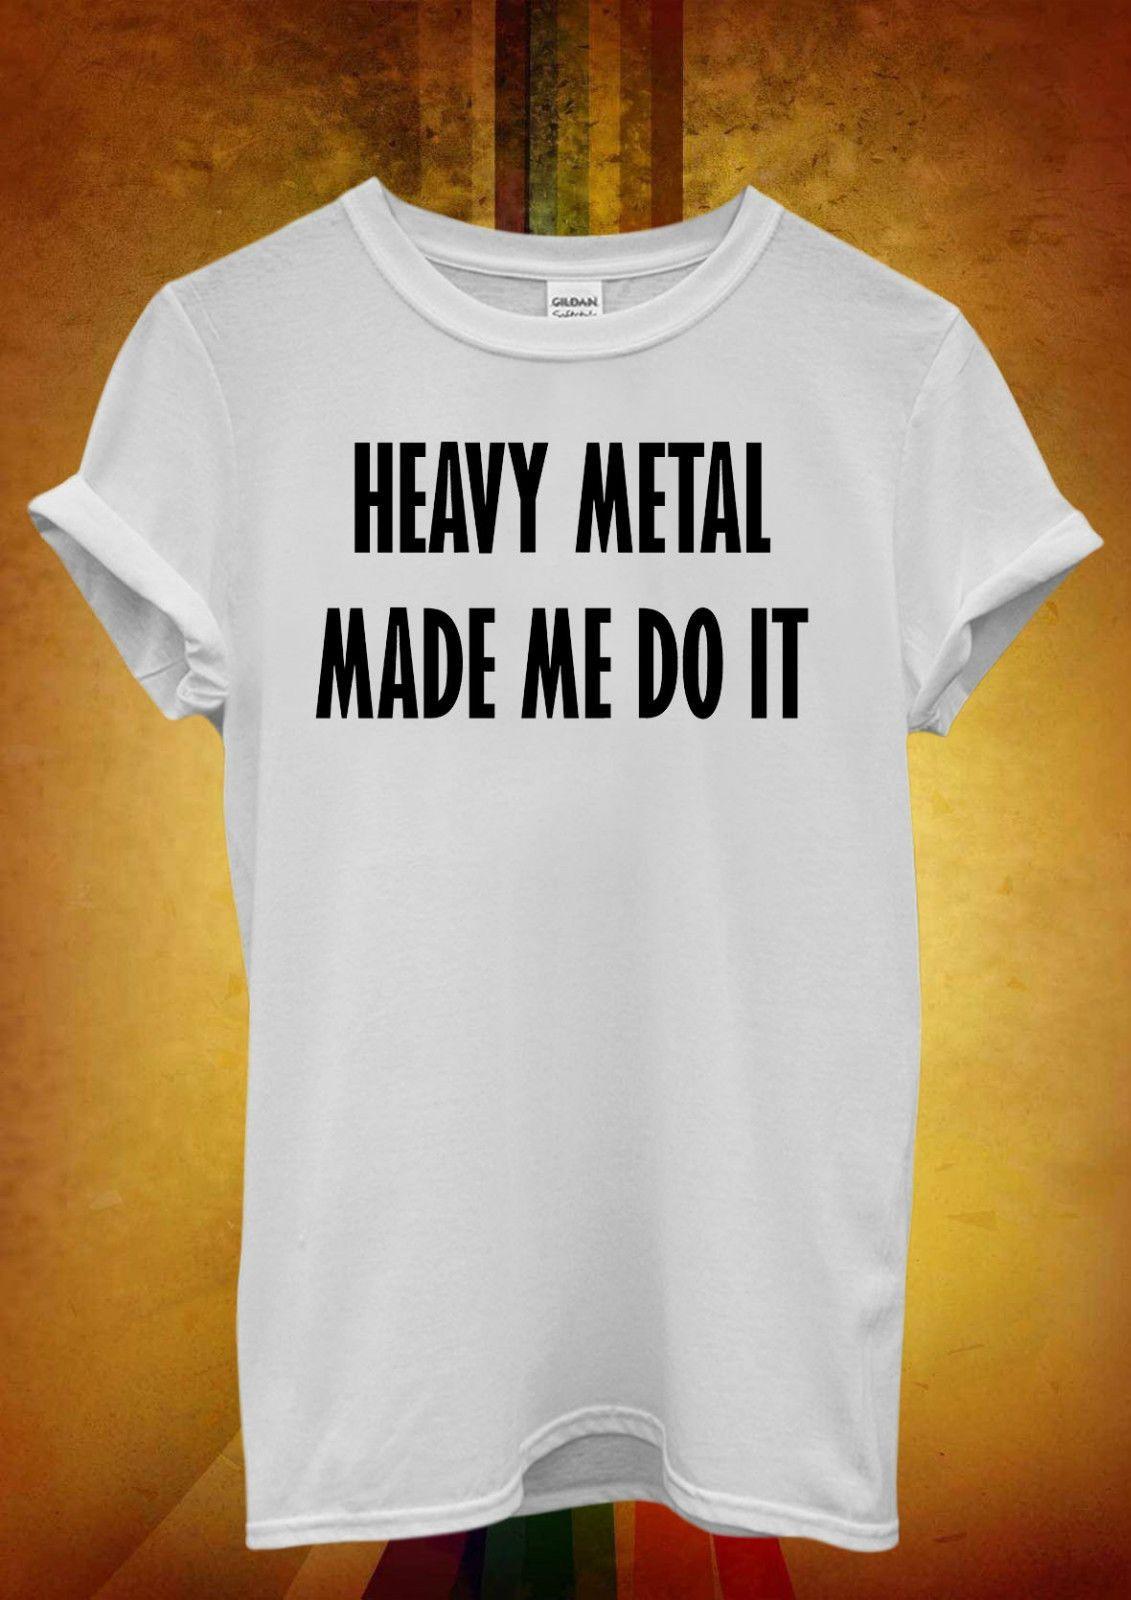 557eac8b4 Heavy Metal Made Me Do It Music Funny Men Women Unisex T Shirt Tank Top  Vest 975 Casual Funny Unisex Tee Gift Online Buy T Shirt Best T Shirt Shop  Online ...